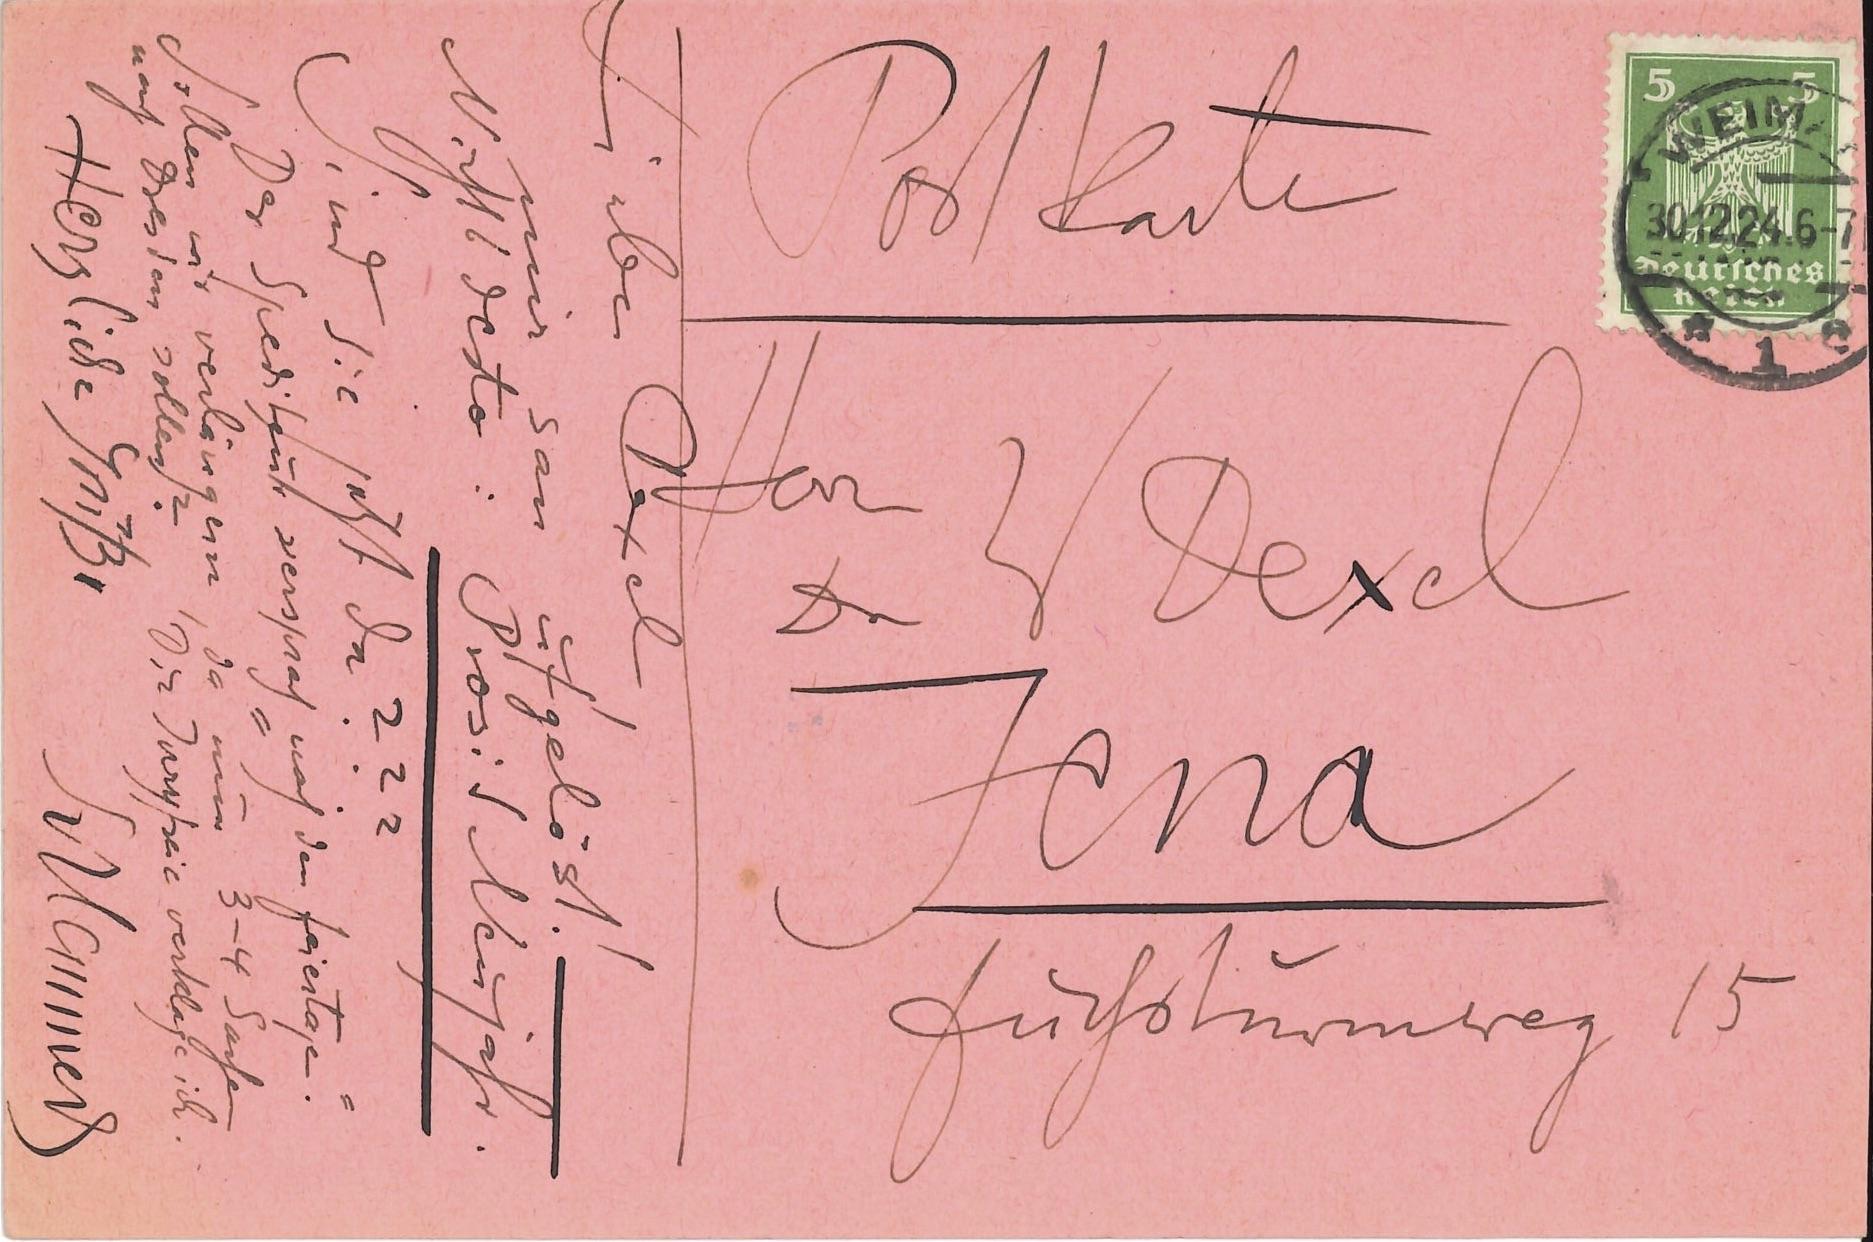 Oskar Schlemmer, Kunstverein Jena 1924 (Invitation) Archiv der Avantgarden, Staatliche Kunstsammlungen Dresden